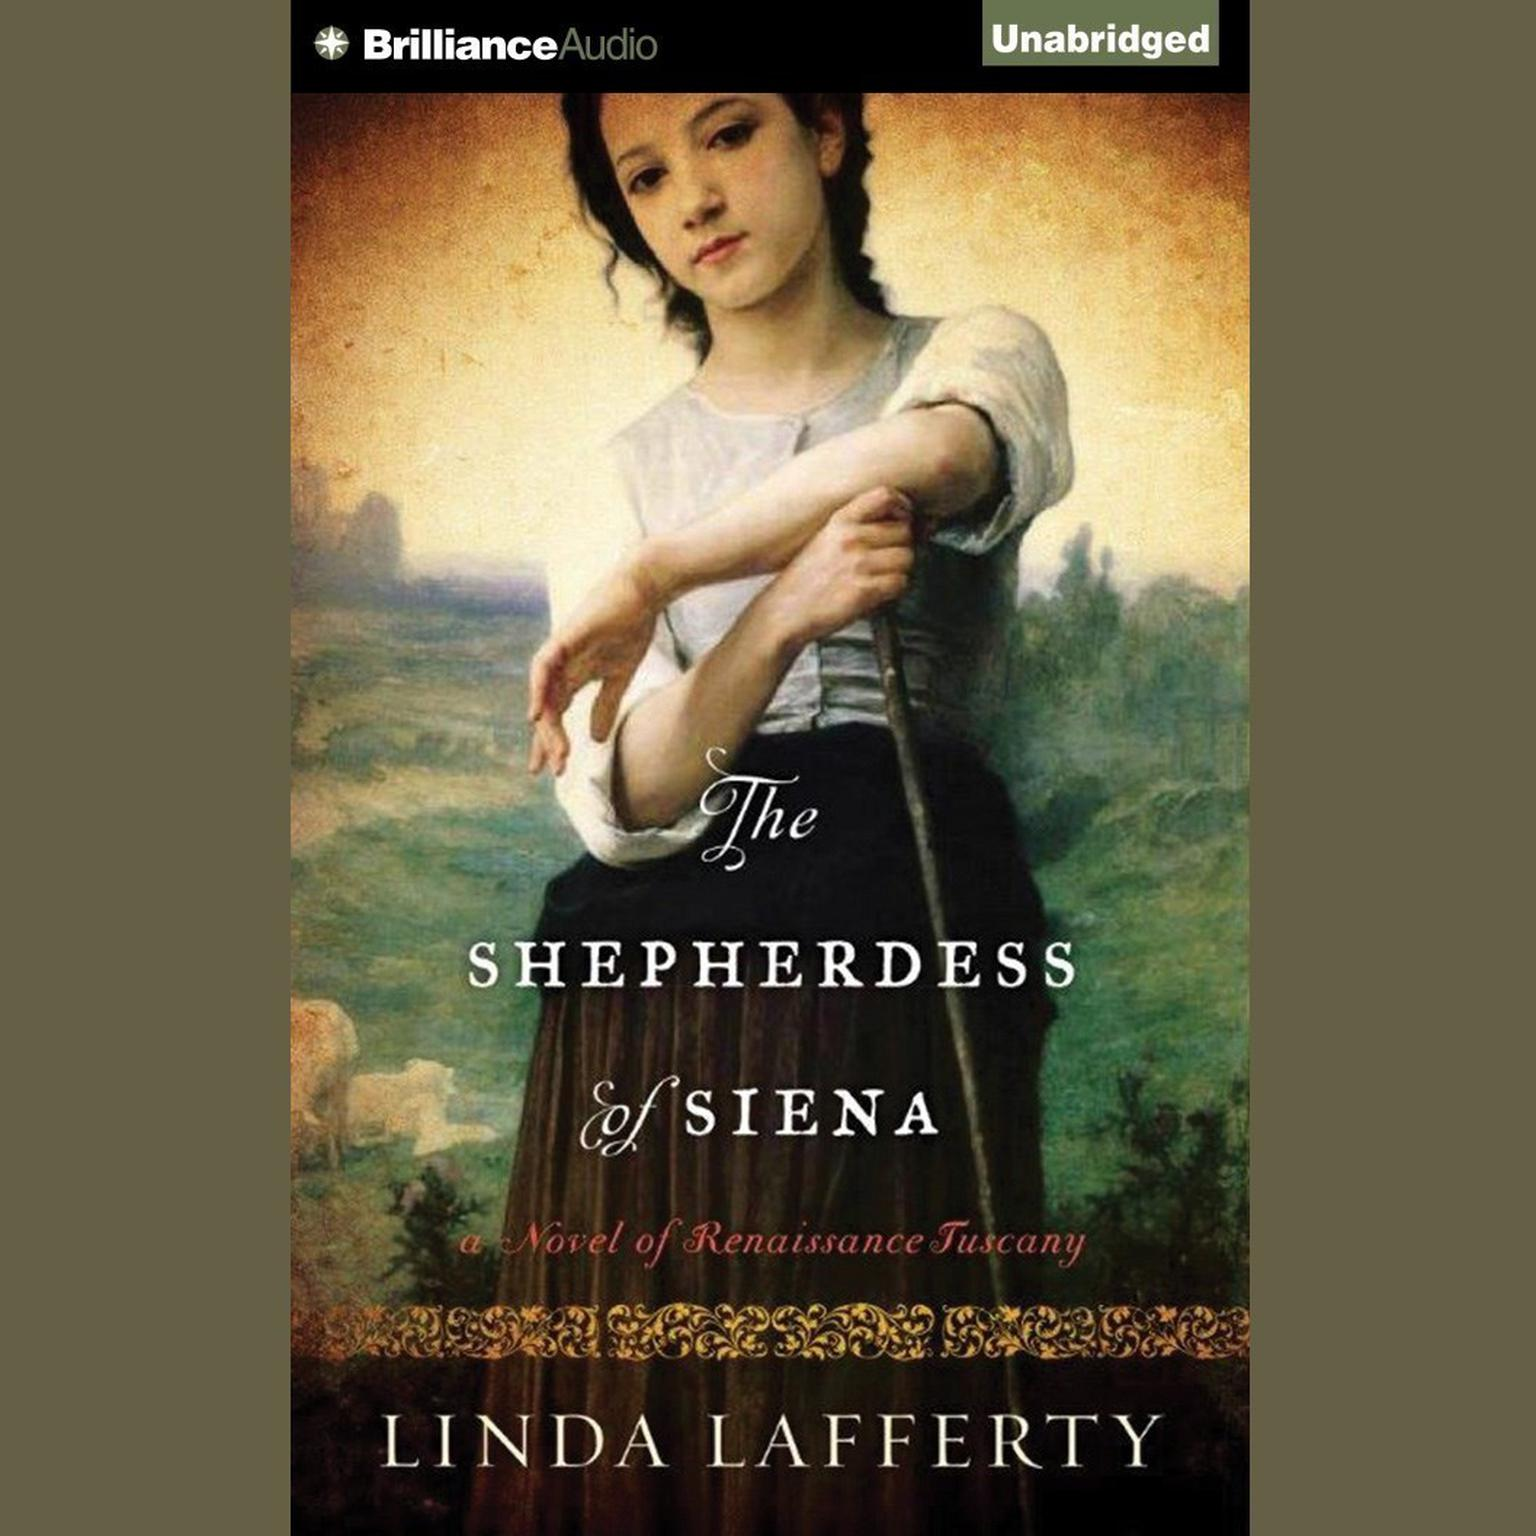 The Shepherdess of Siena: A Novel of Renaissance Tuscany Audiobook, by Linda Lafferty